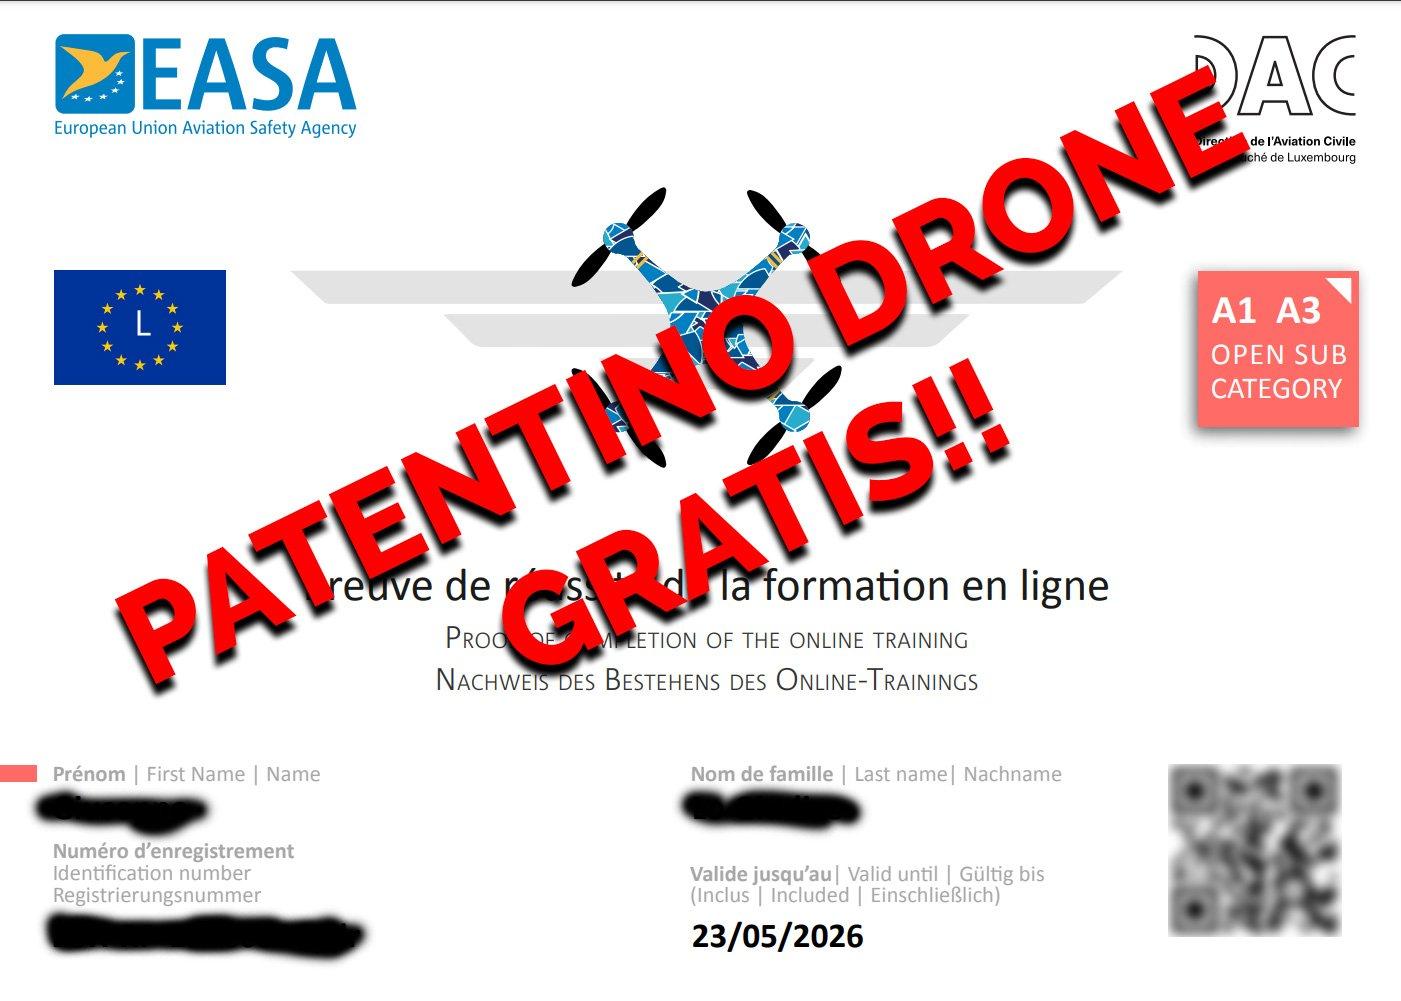 PATENTINO-DRONE-EASA-GRATIS